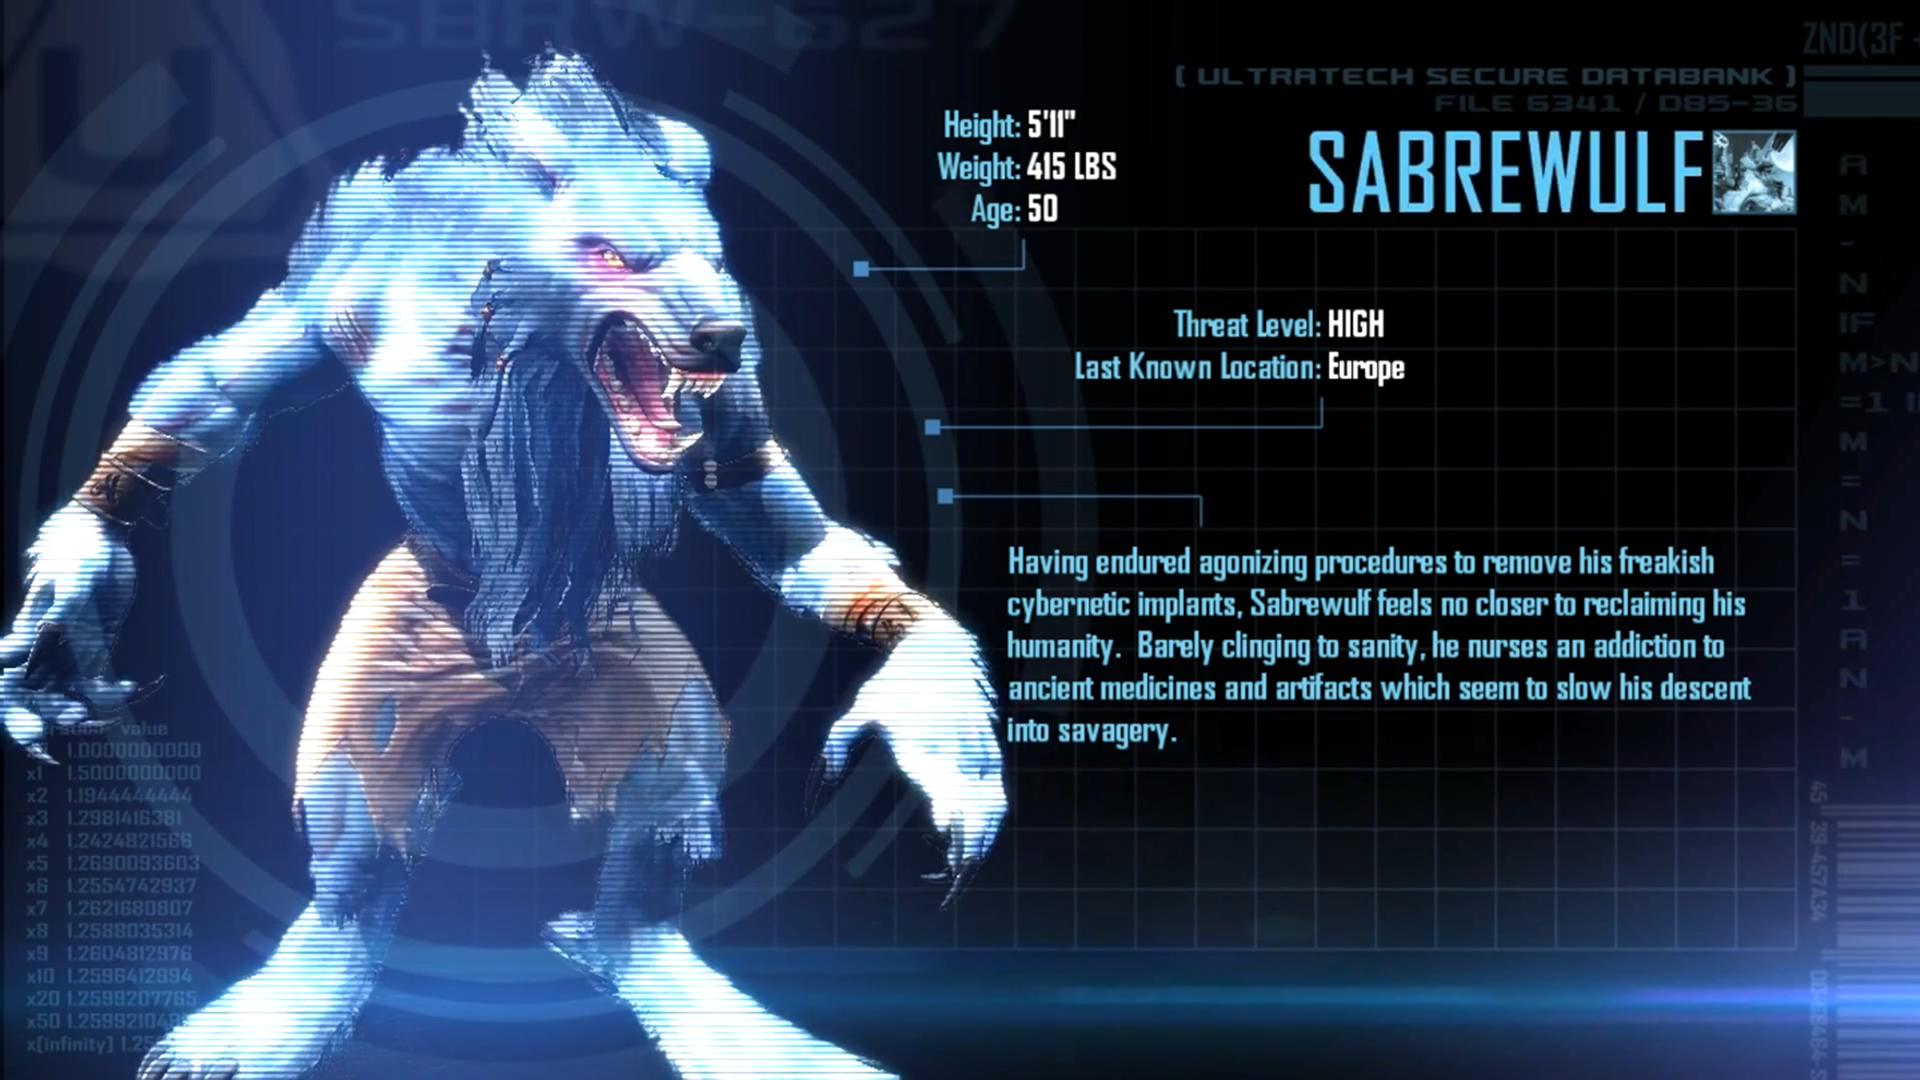 [Image: Sabrewulf_Arcade_Bio.png]